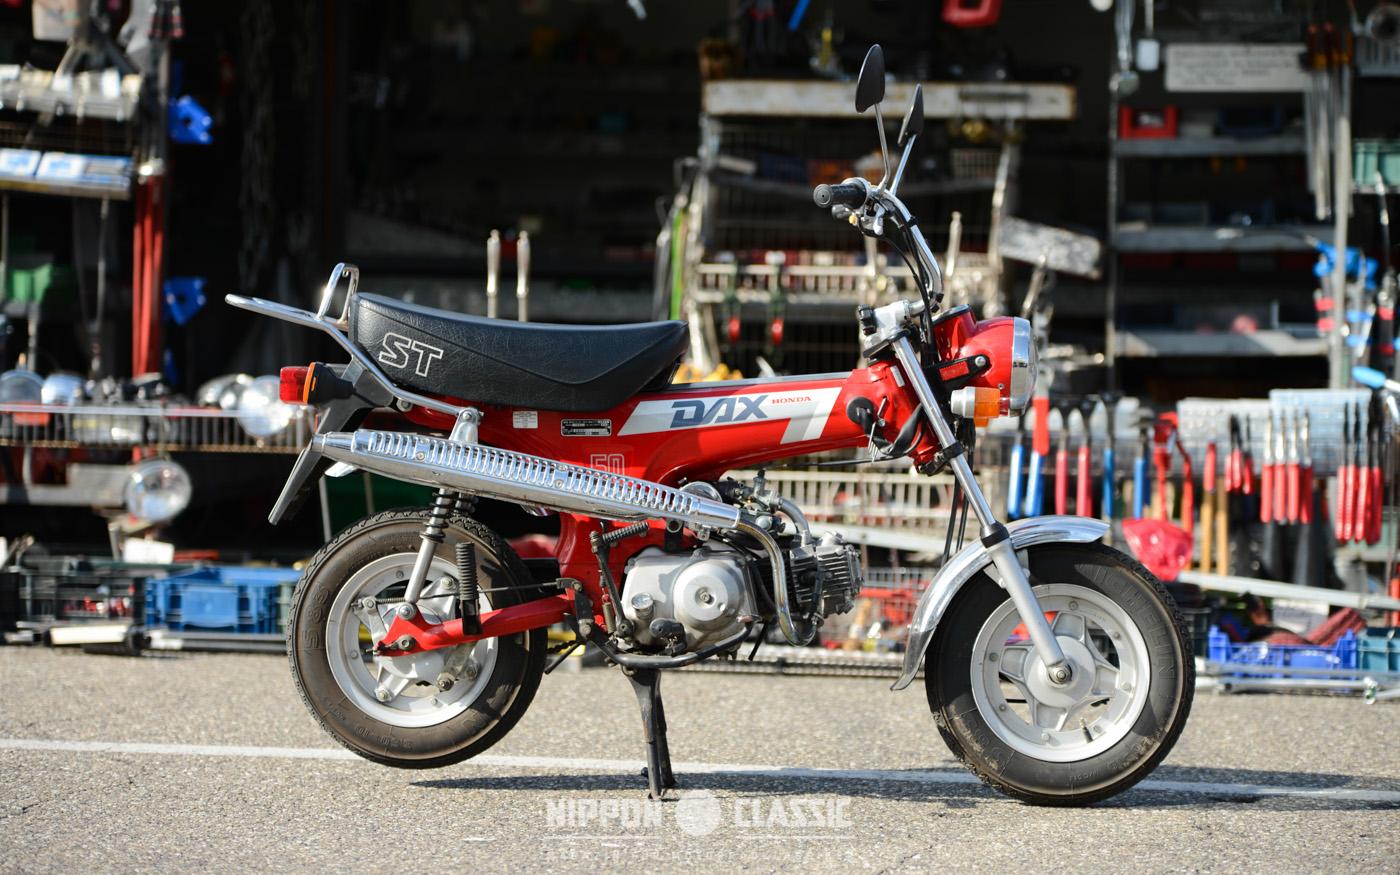 honda dax 1969 1999 mini motorrad f r die westentasche. Black Bedroom Furniture Sets. Home Design Ideas